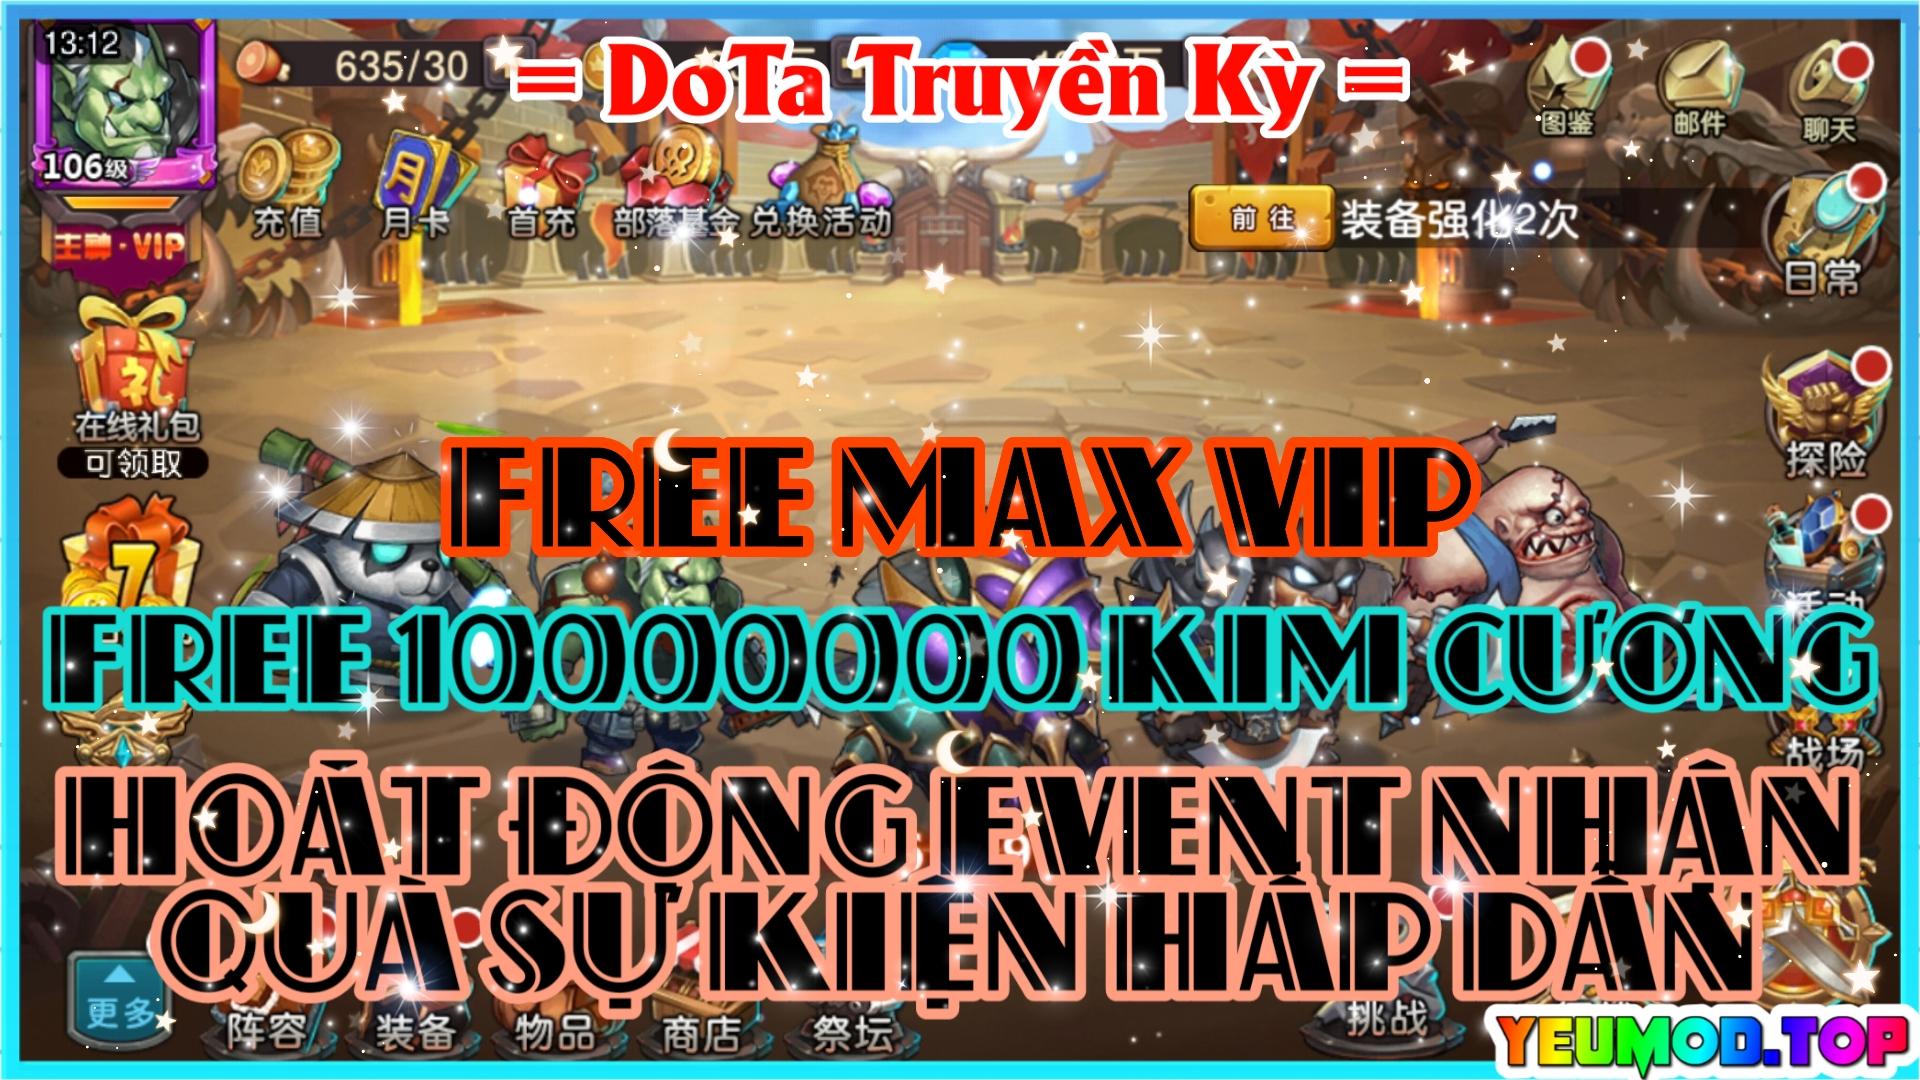 DoTa  Truyền Kỳ Private | Free Full VIP | 10000000 Kim Cương | Event Nhận Quà Hấp Dẫn